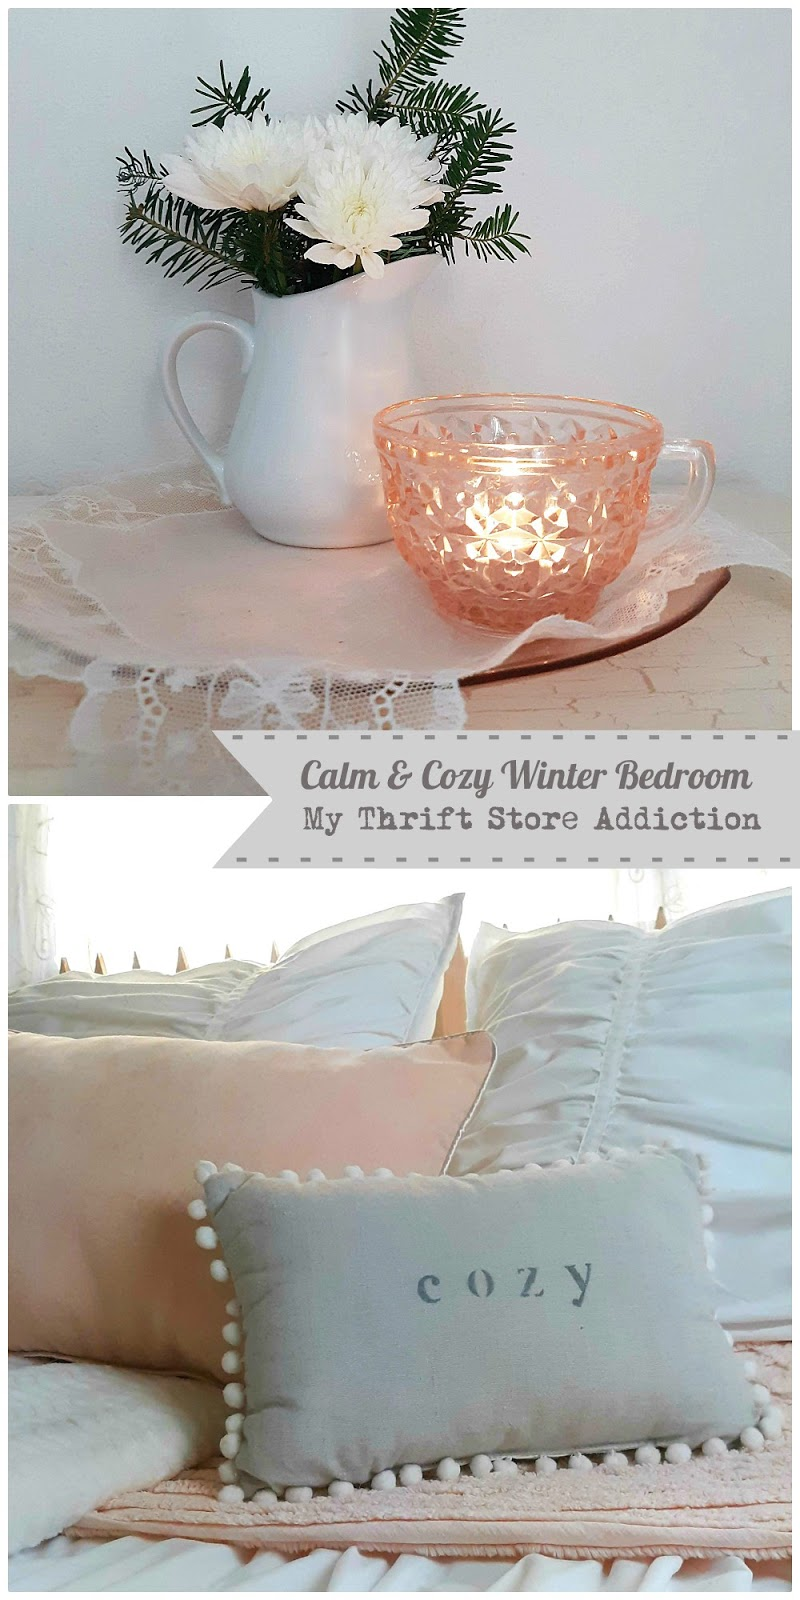 calm and cozy winter bedroom